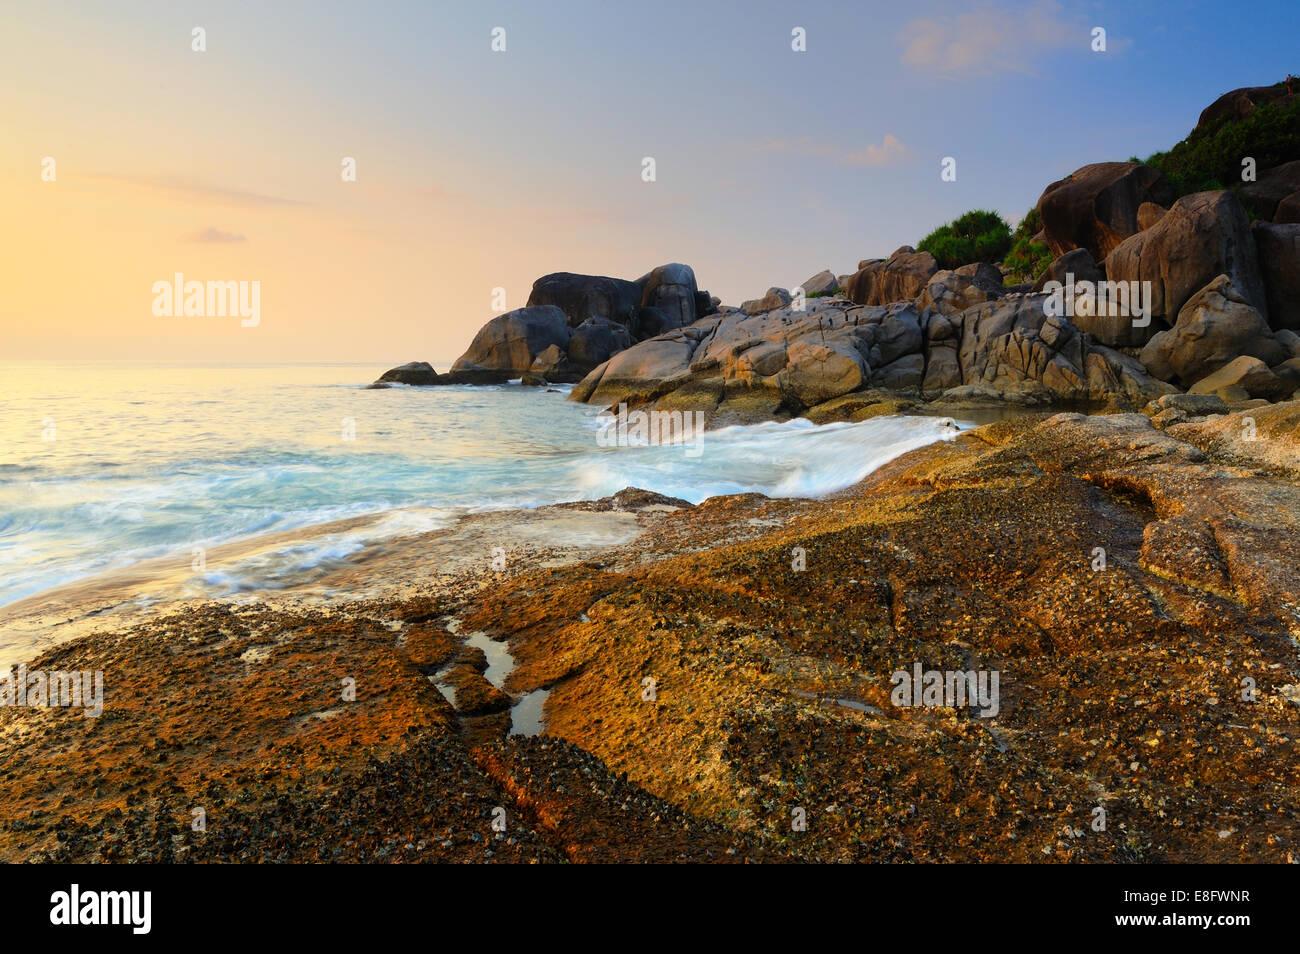 Thailand, Beautiful seascape of Similan island shore - Stock Image